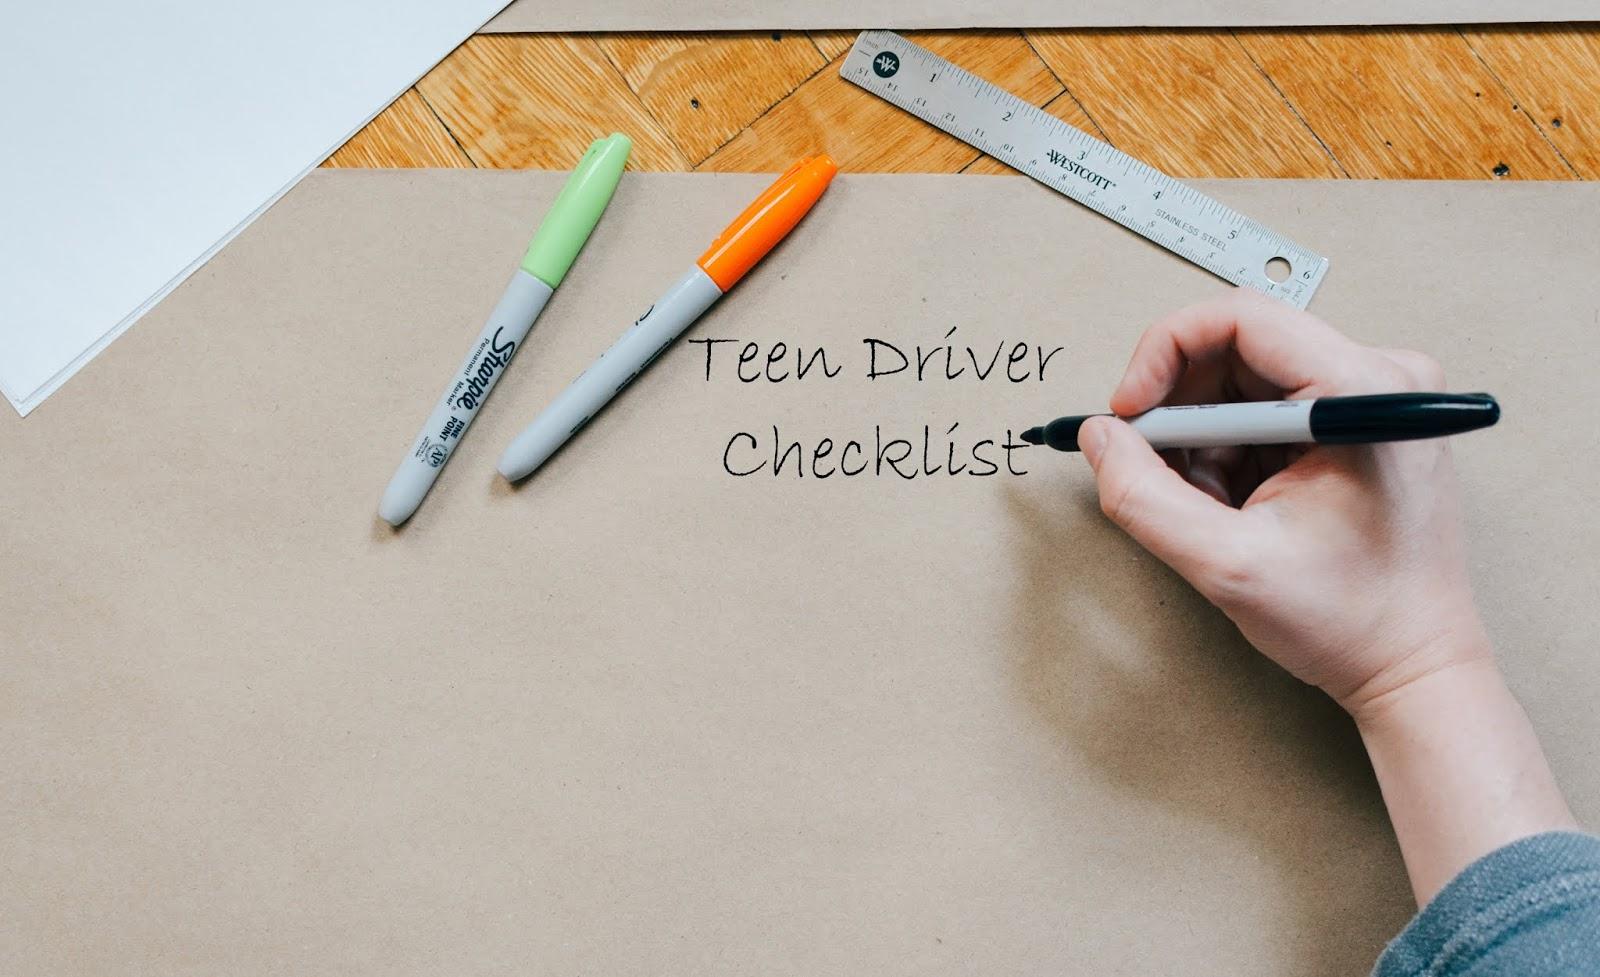 New Teen Driver Checklist Nycm Insurance Blog